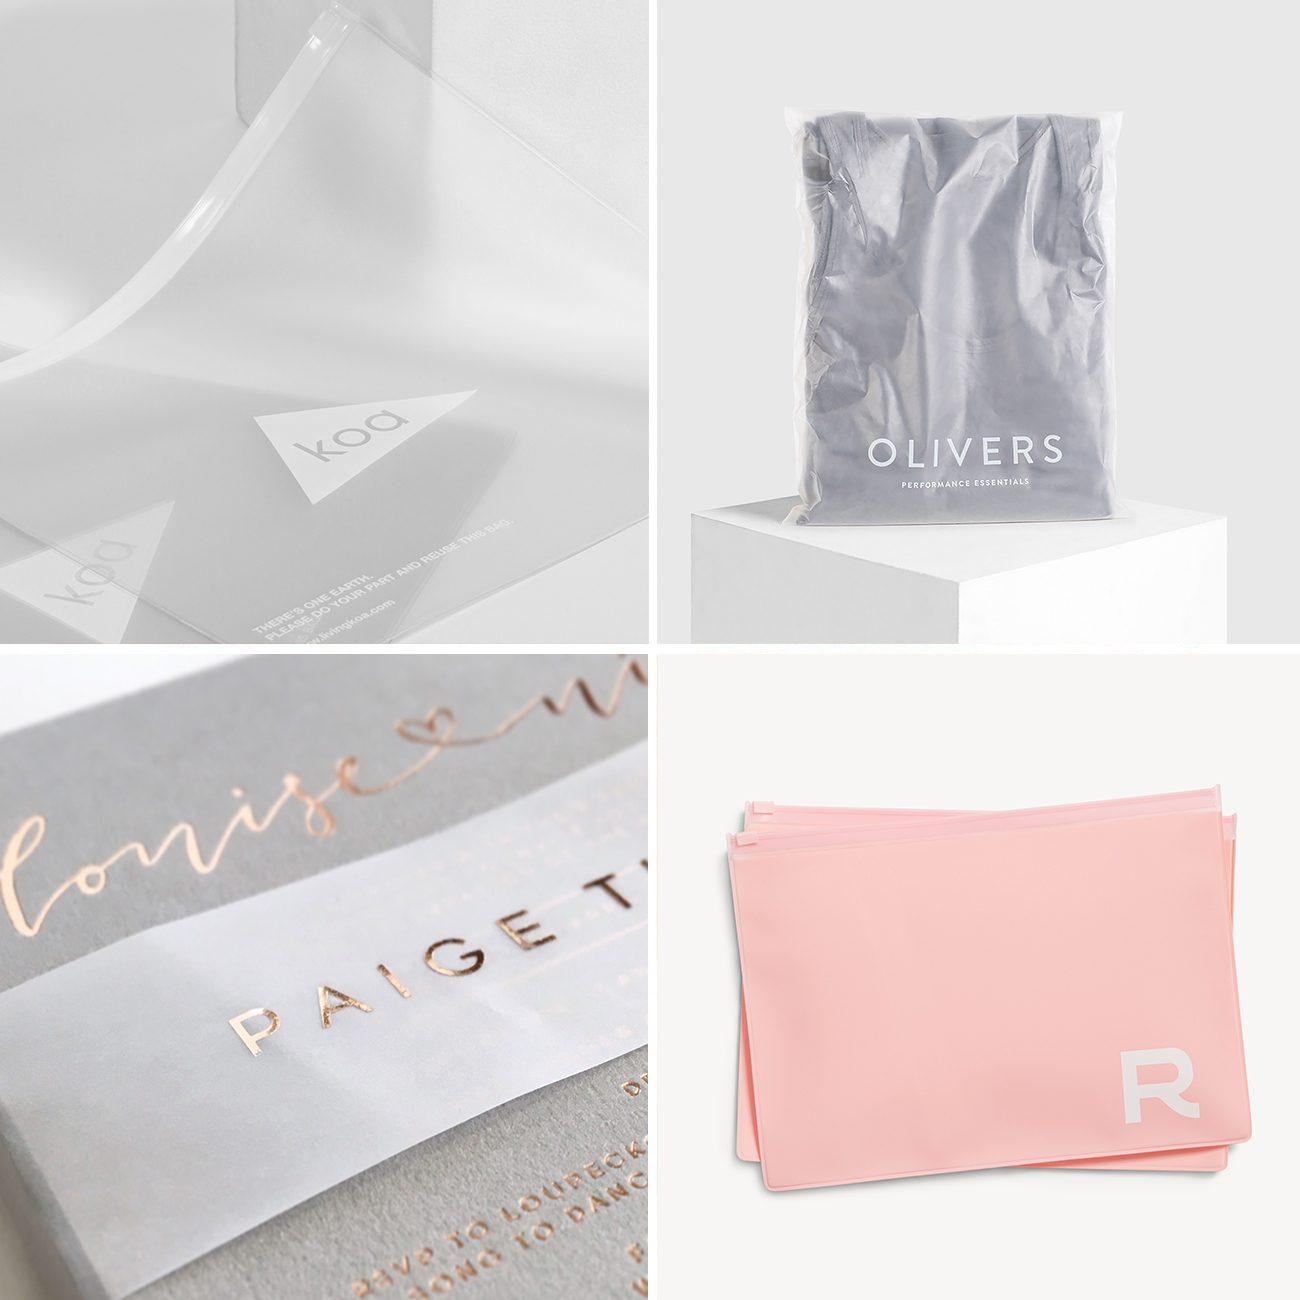 Photos via: MM La Fleur, Lumi, Paige Tuzée 90 Ideas to Spruce Up Your Holiday Packaging Design